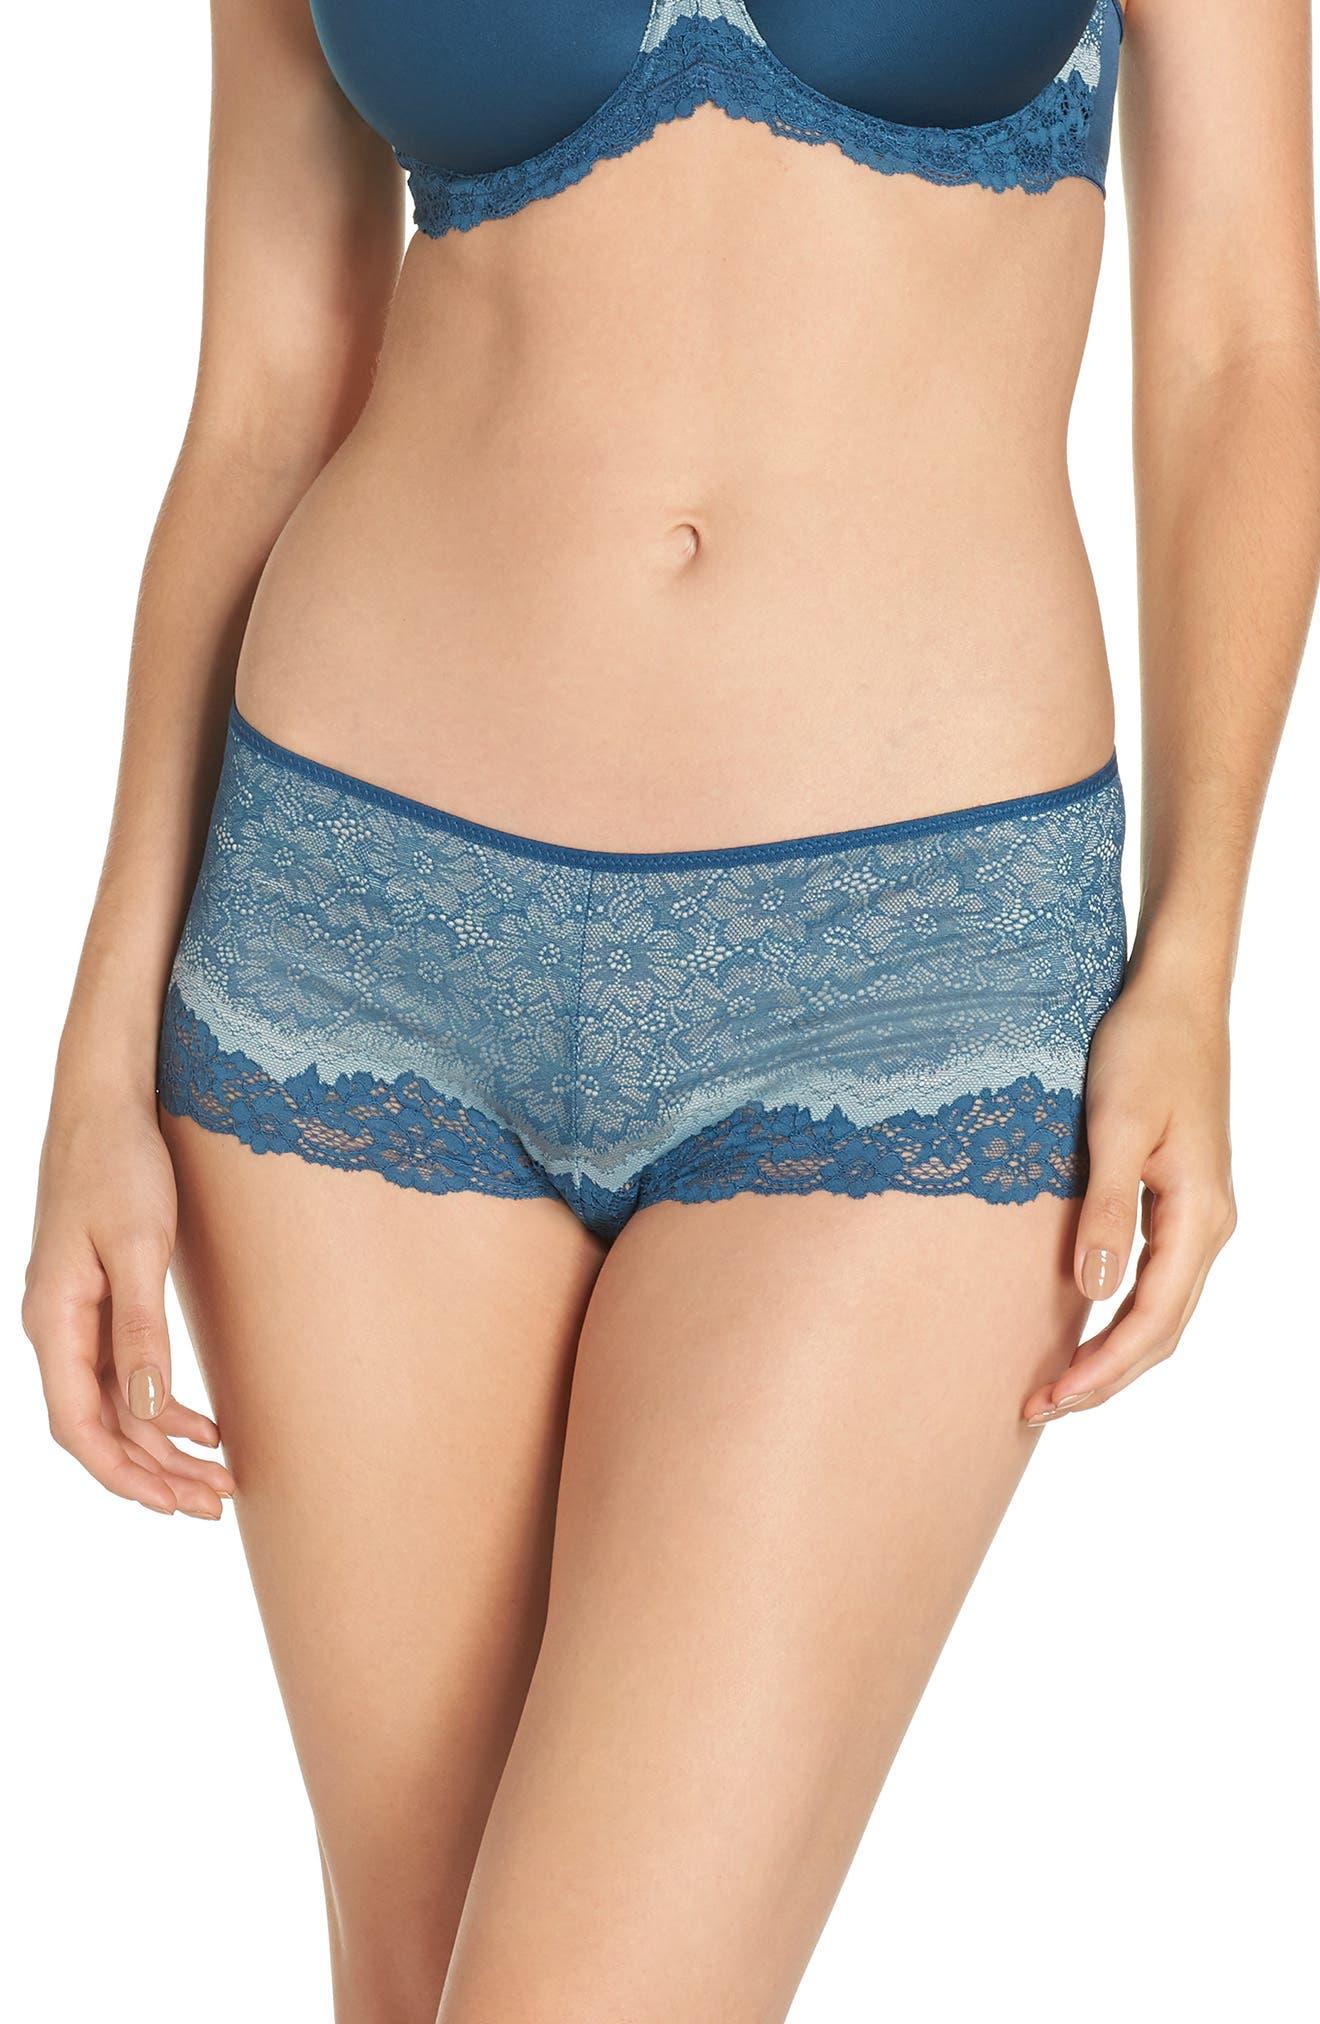 Lace Boyshorts,                         Main,                         color, MAJOLICA BLUE/ SLATE